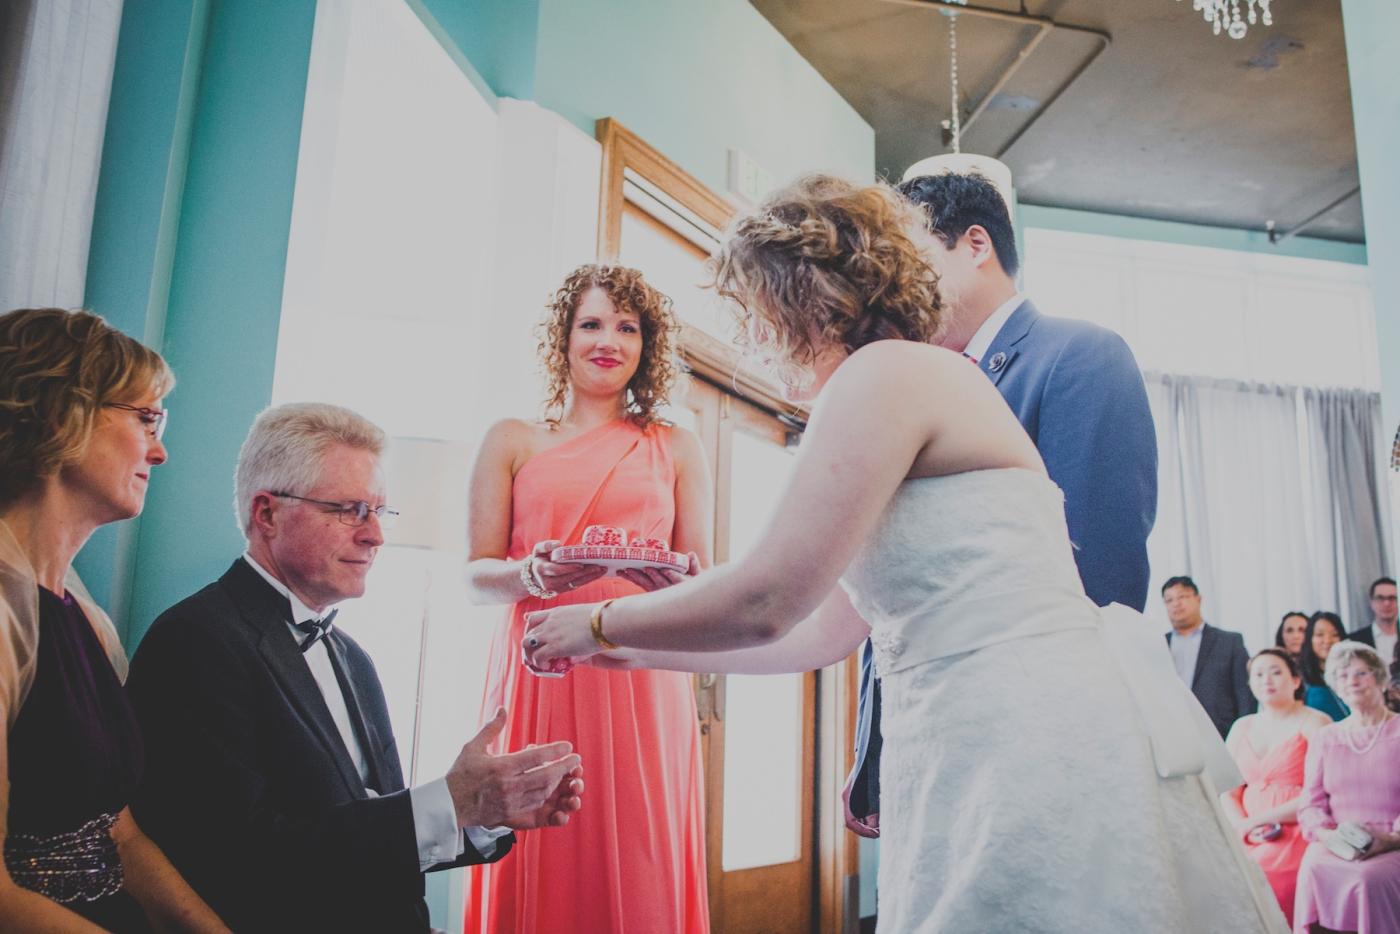 DSC_2992Everett_Wedding_Ballroom_Jane_Speleers_photography_Rachel_and_Edmund_teaceremony_2017